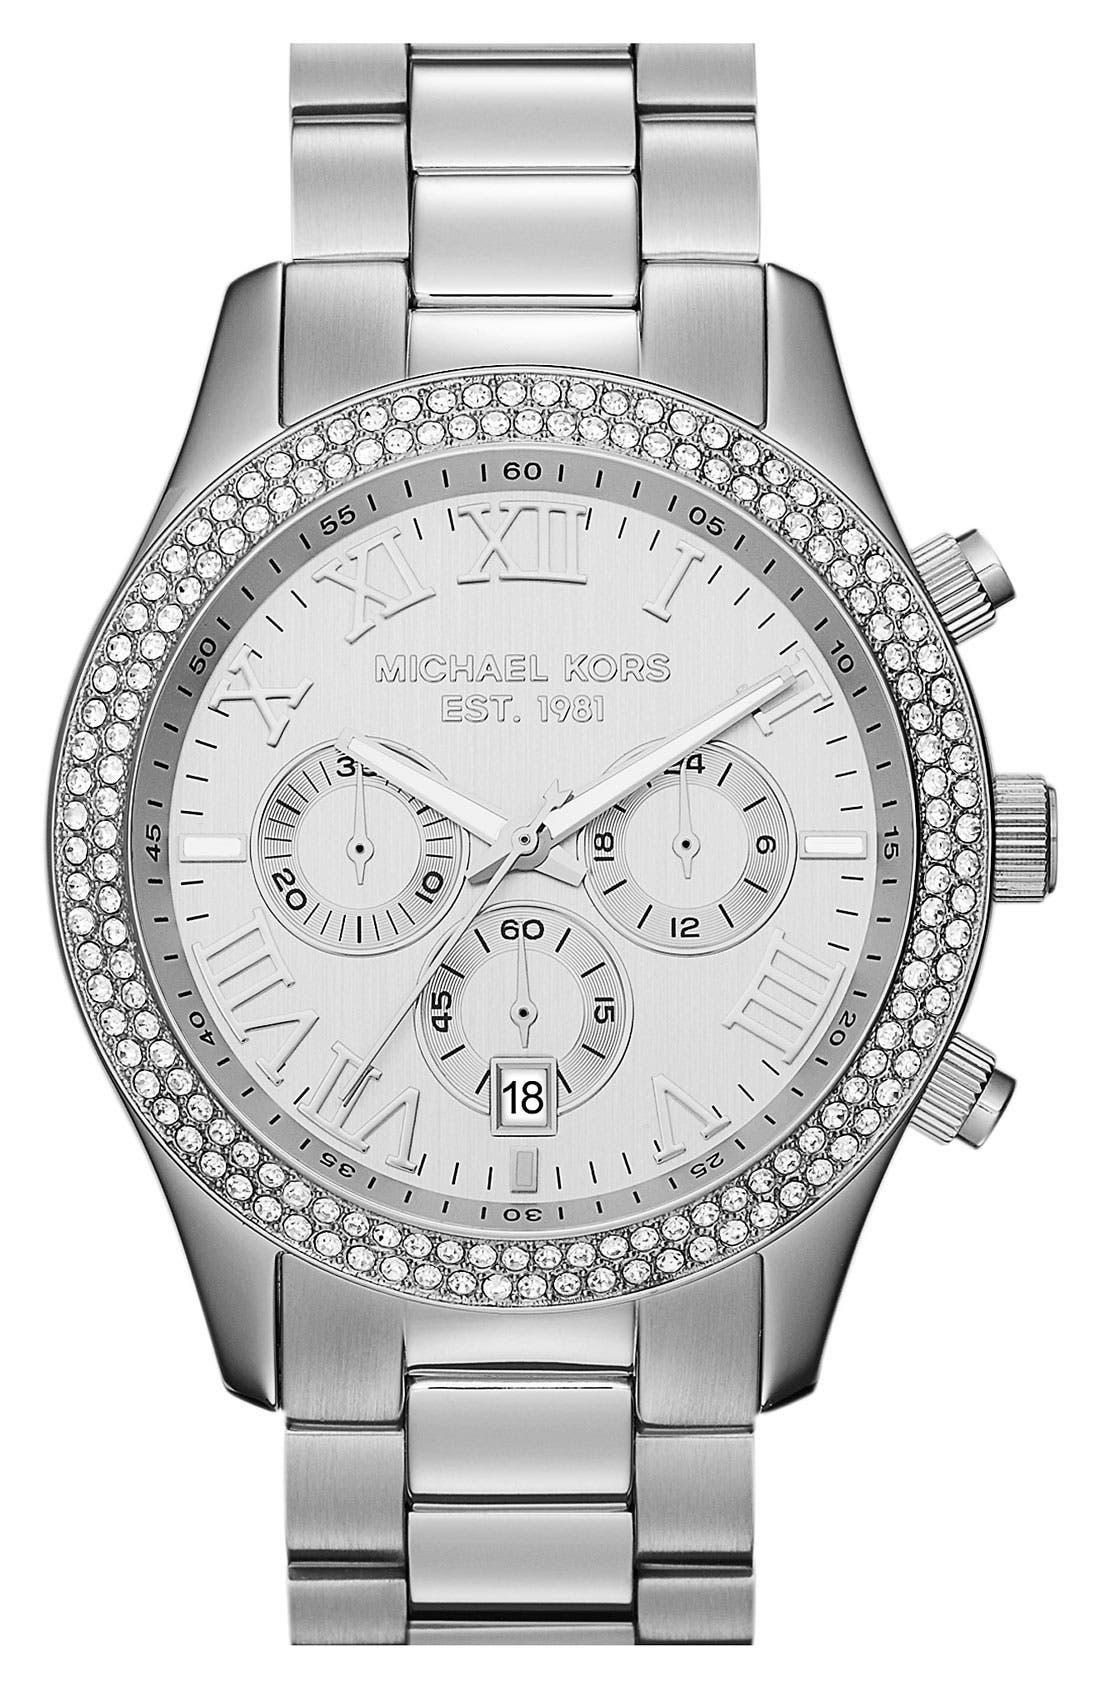 Main Image - Michael Kors 'Layton' Chronograph Bracelet Watch, 44mm